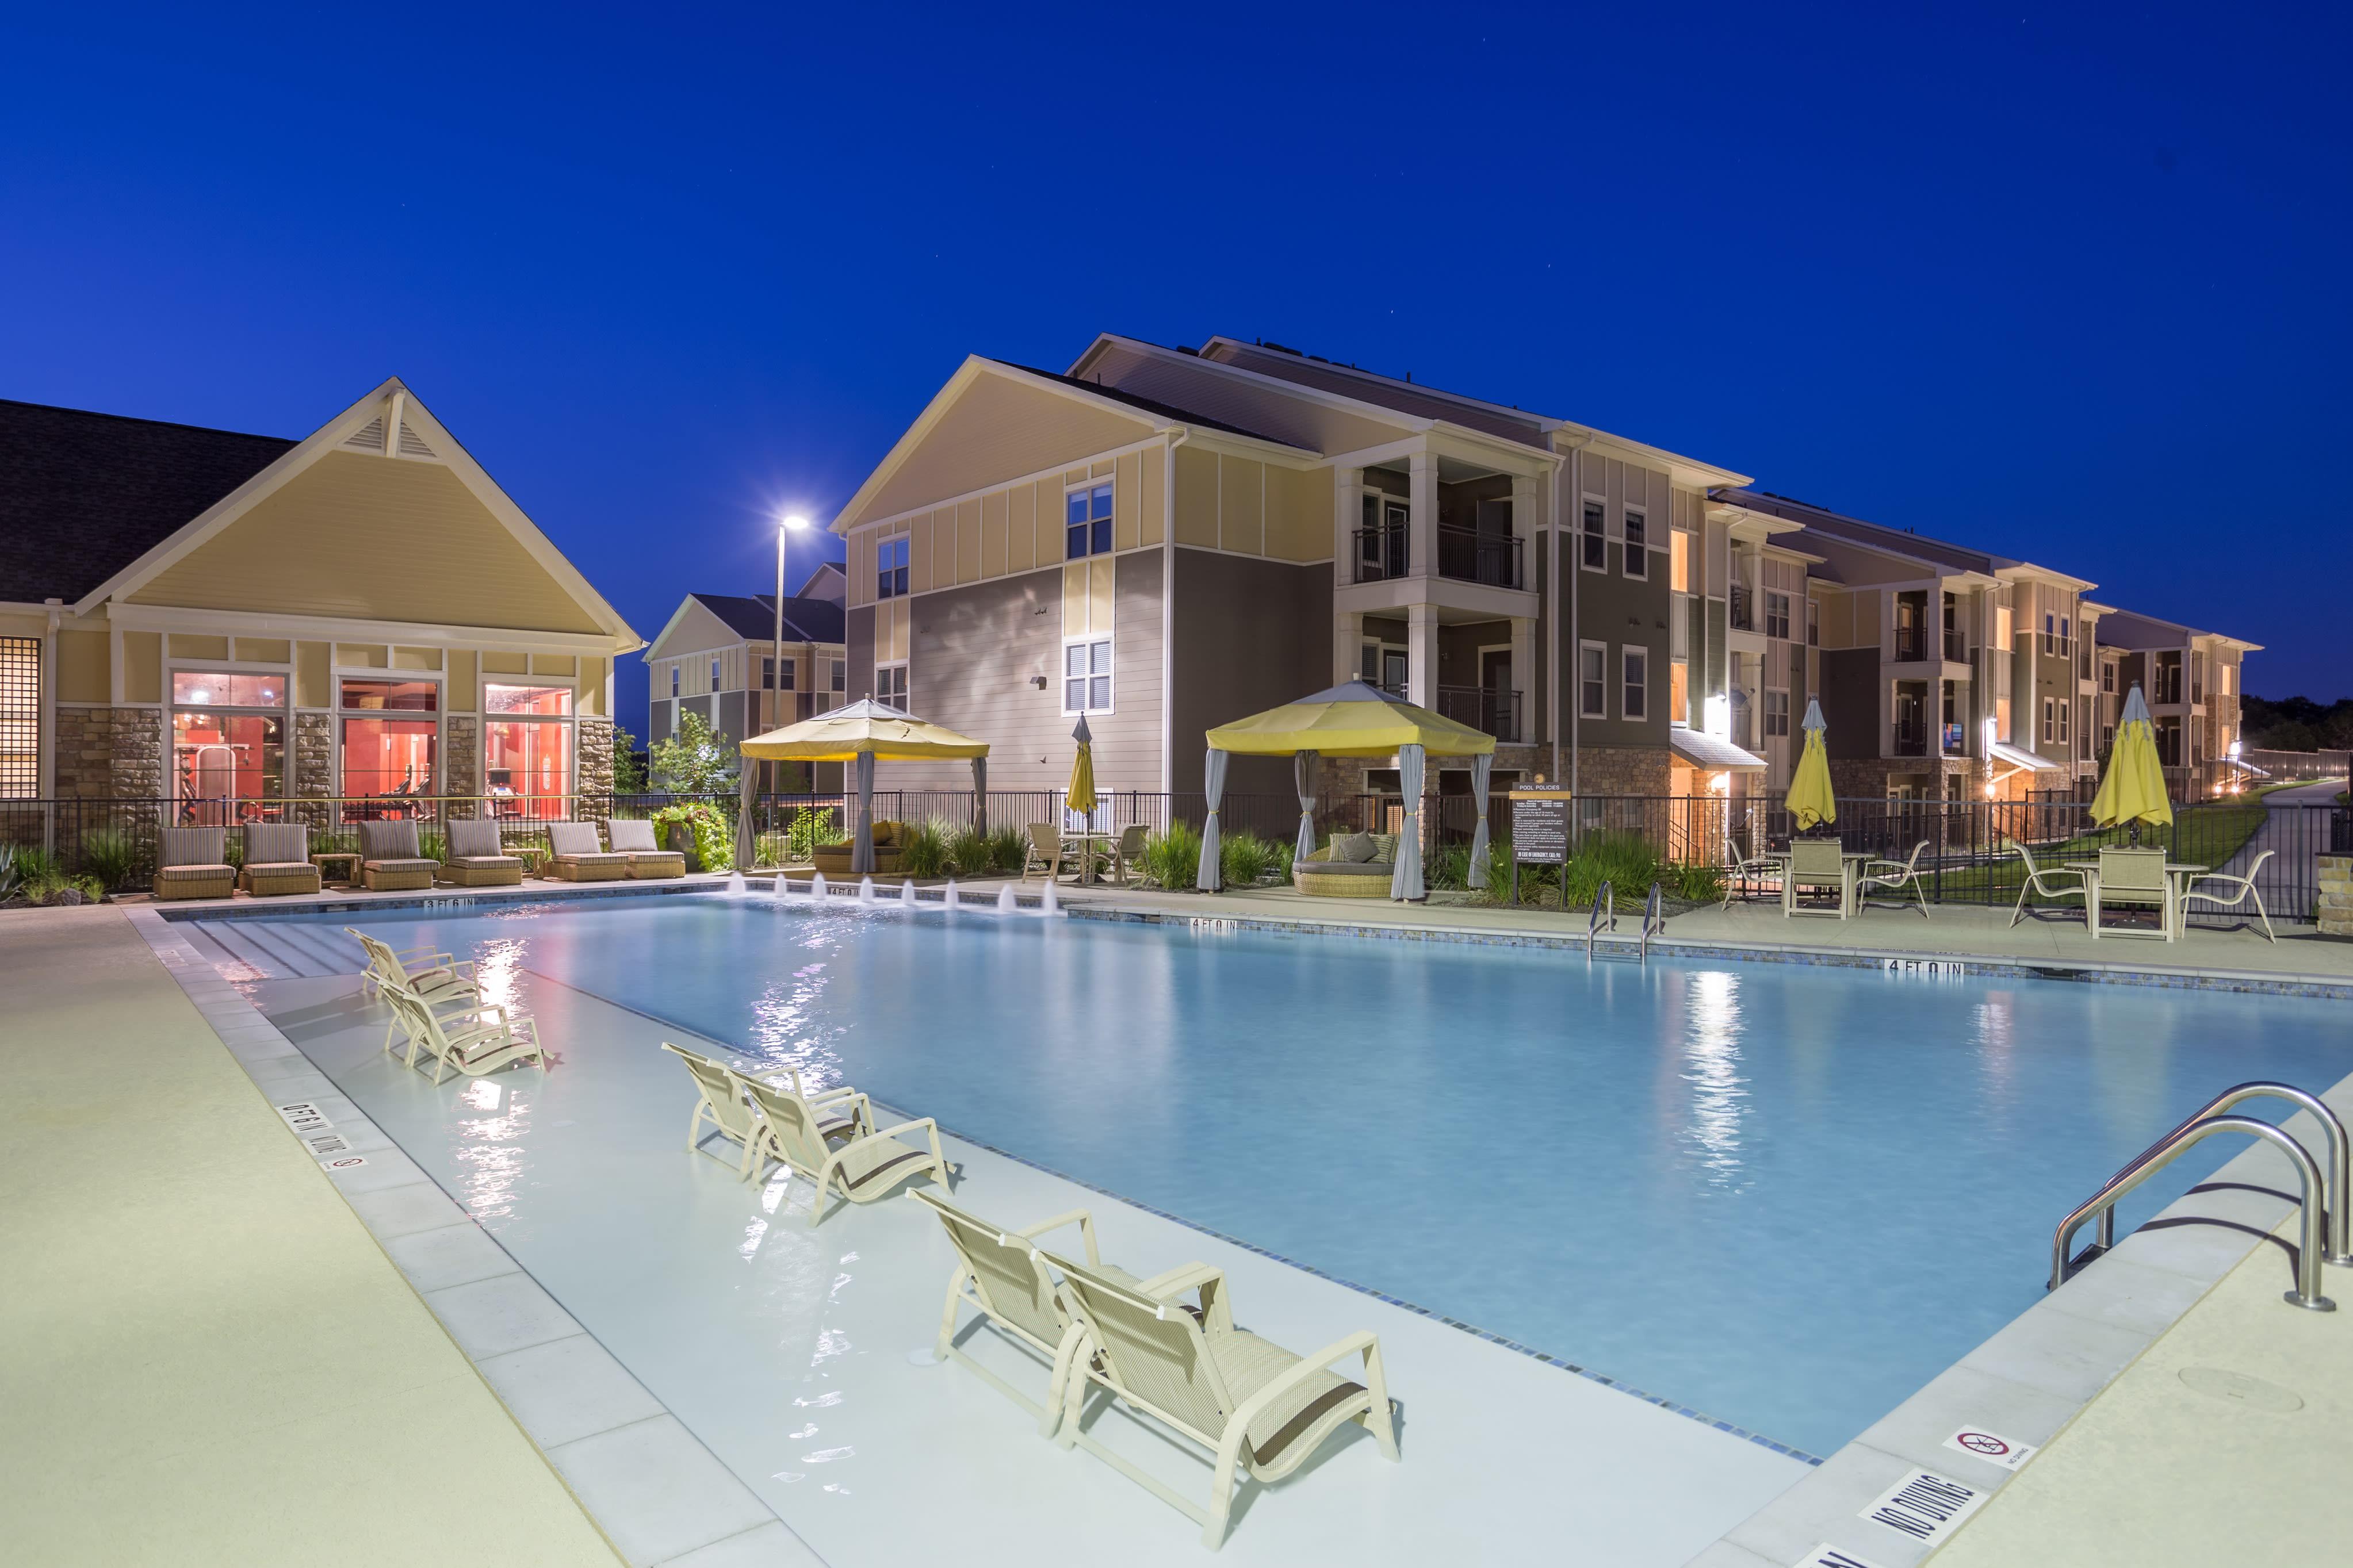 Night view of the pool at Encore 281 in San Antonio, Texas